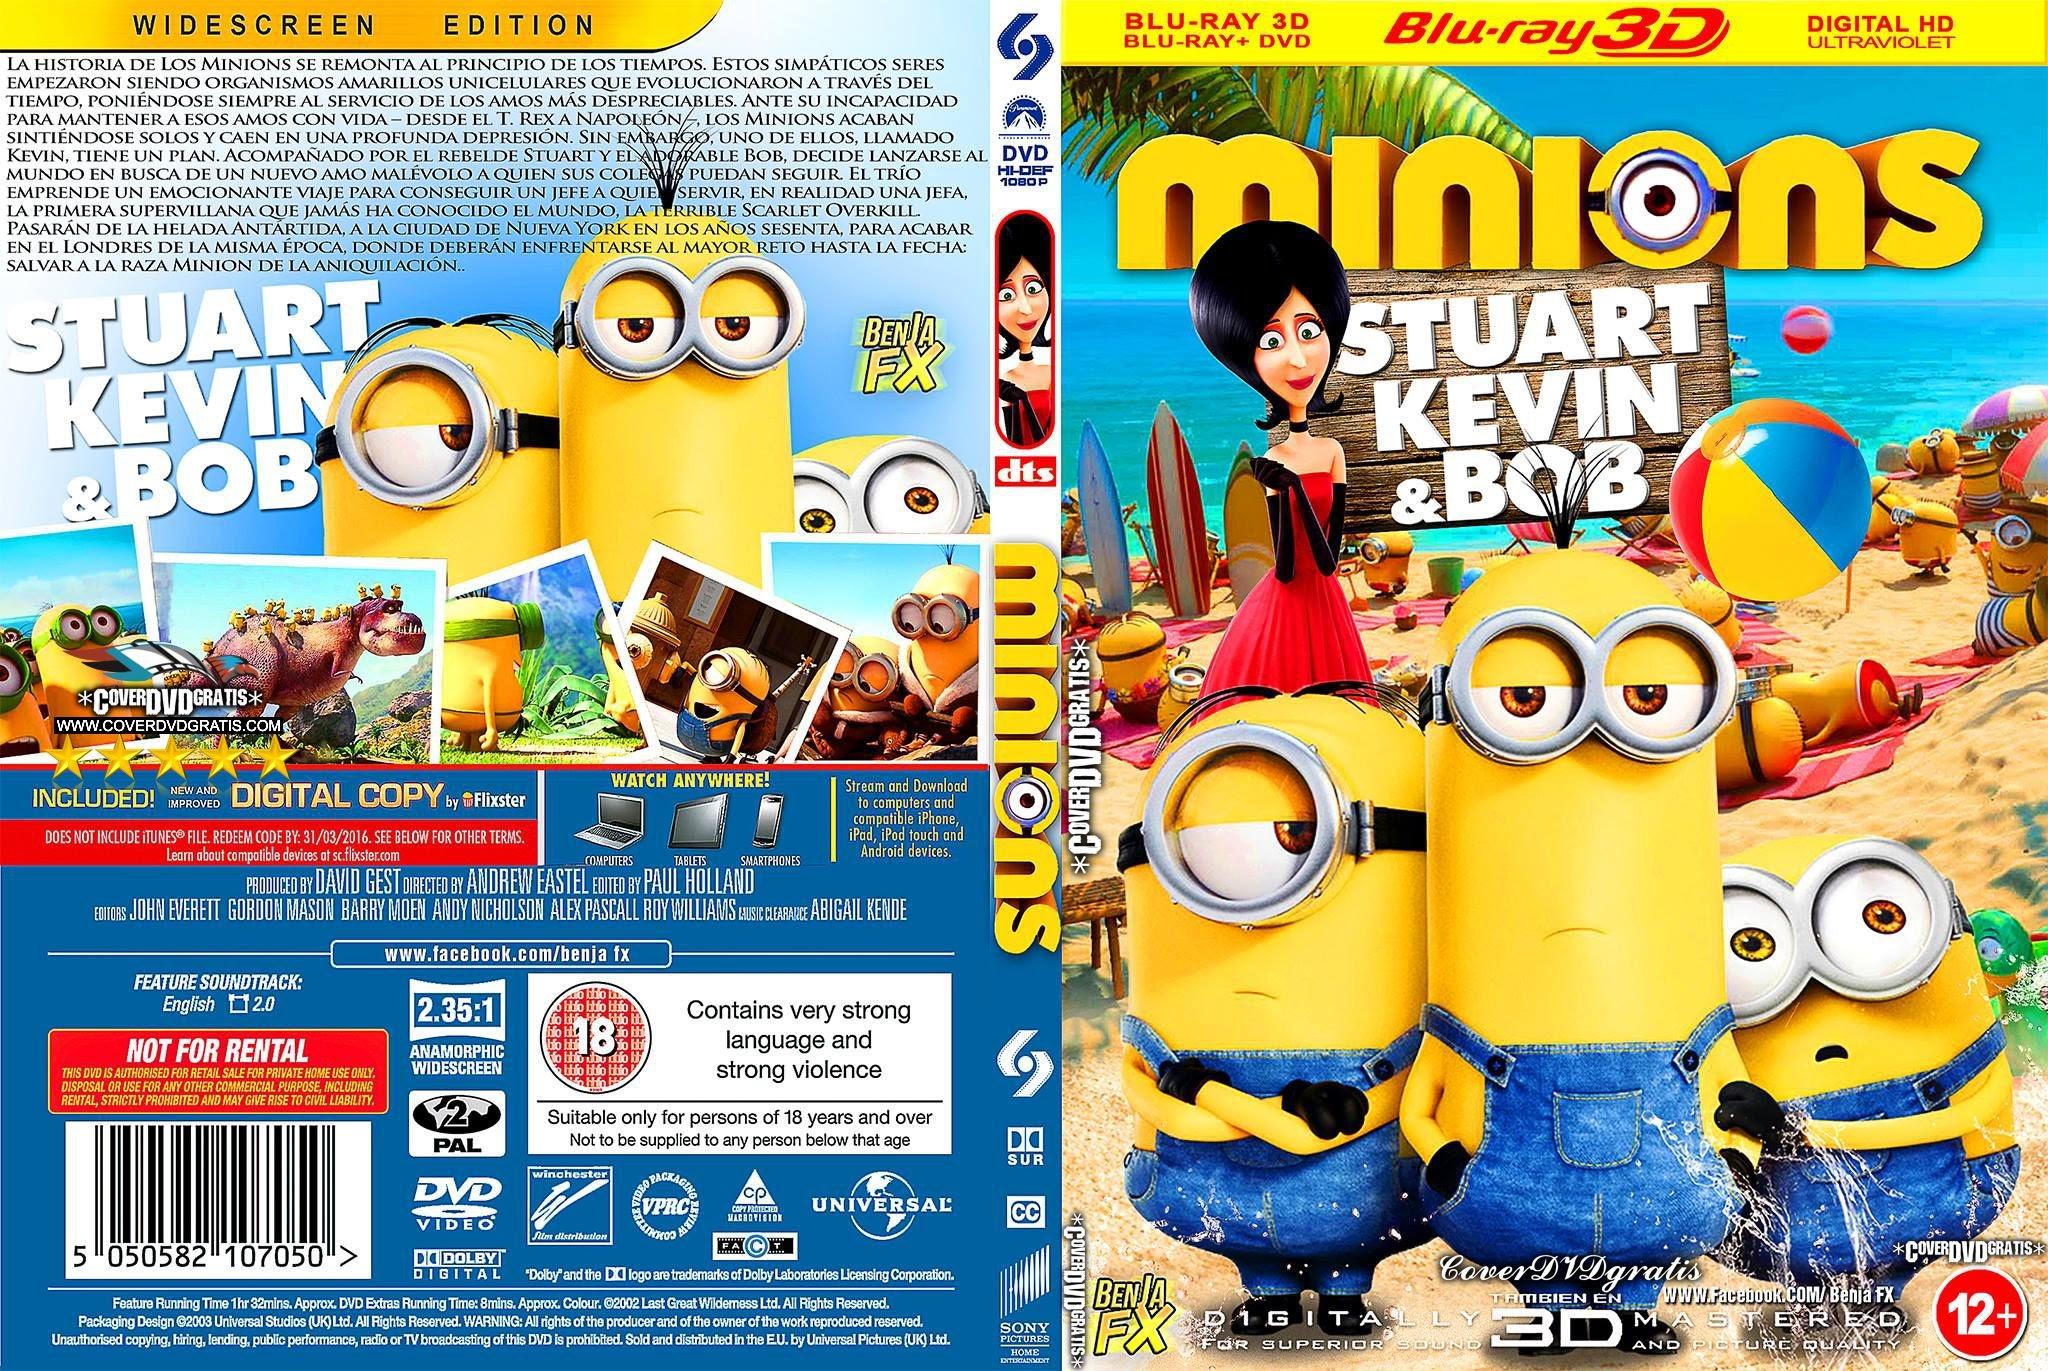 Minions Film Auf Dvd